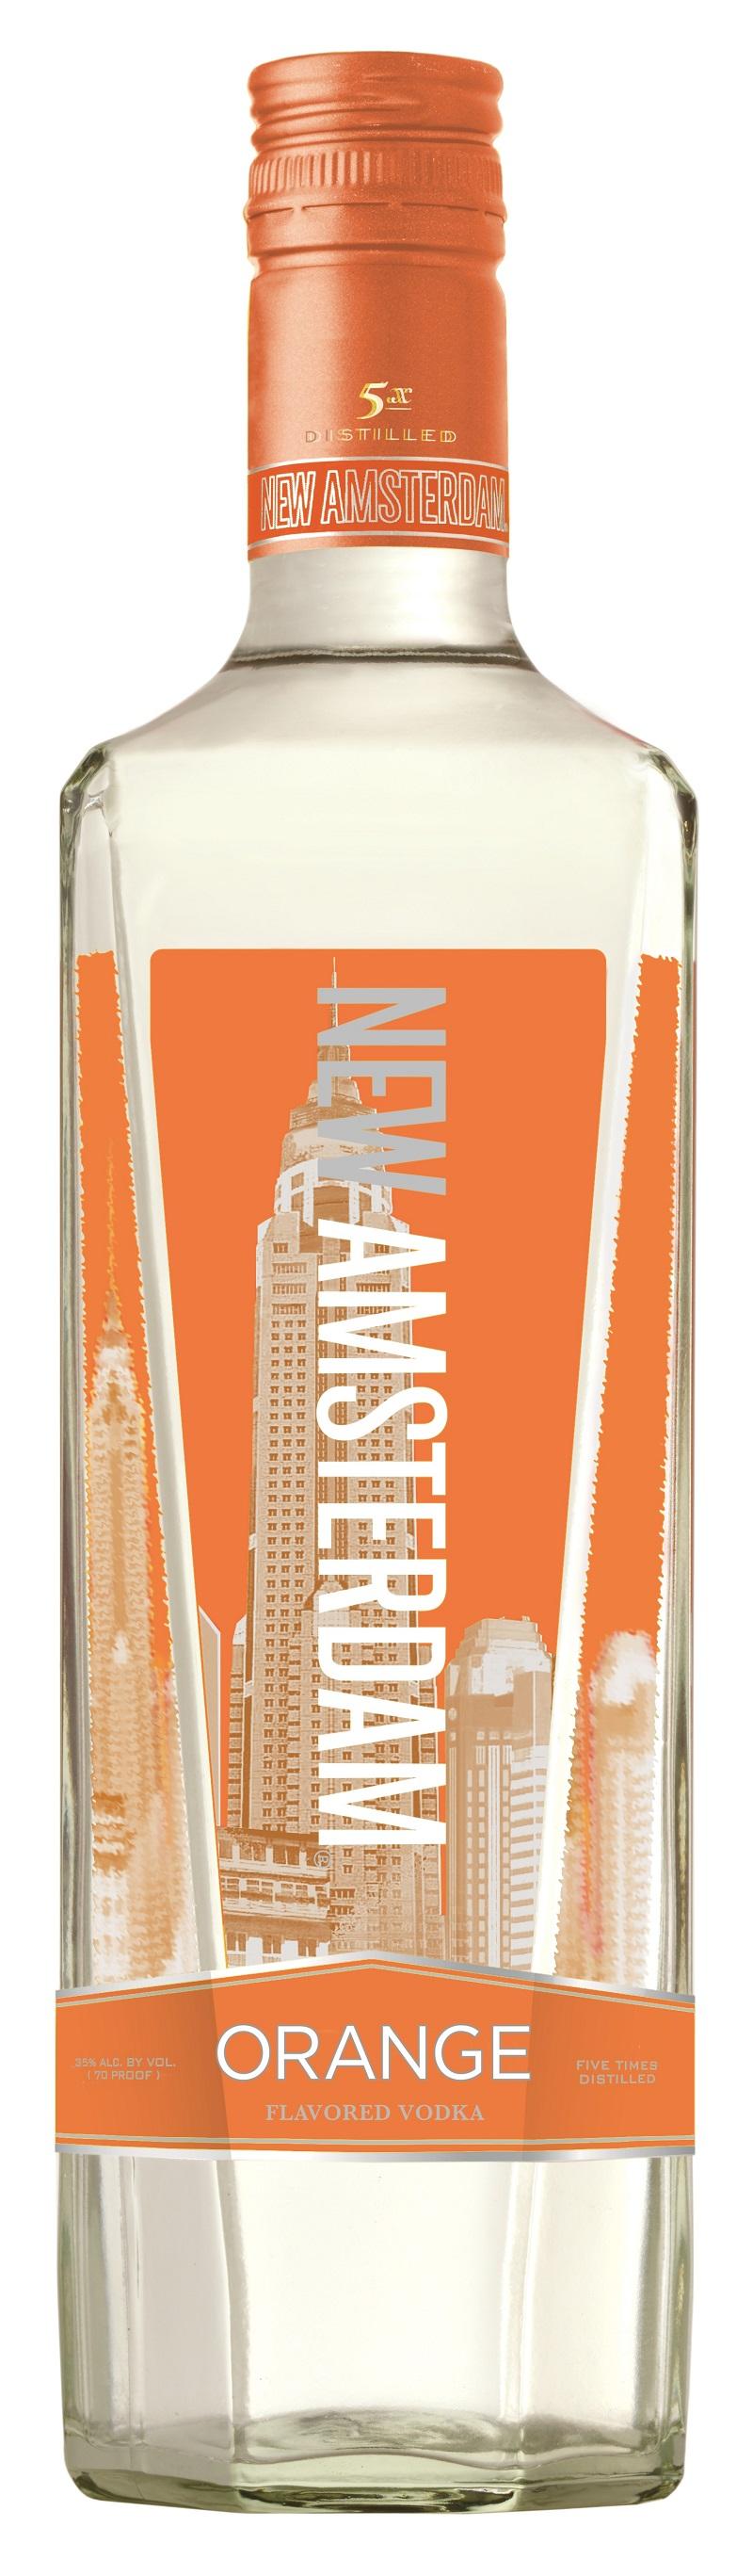 New Amsterdam Orange Vodka